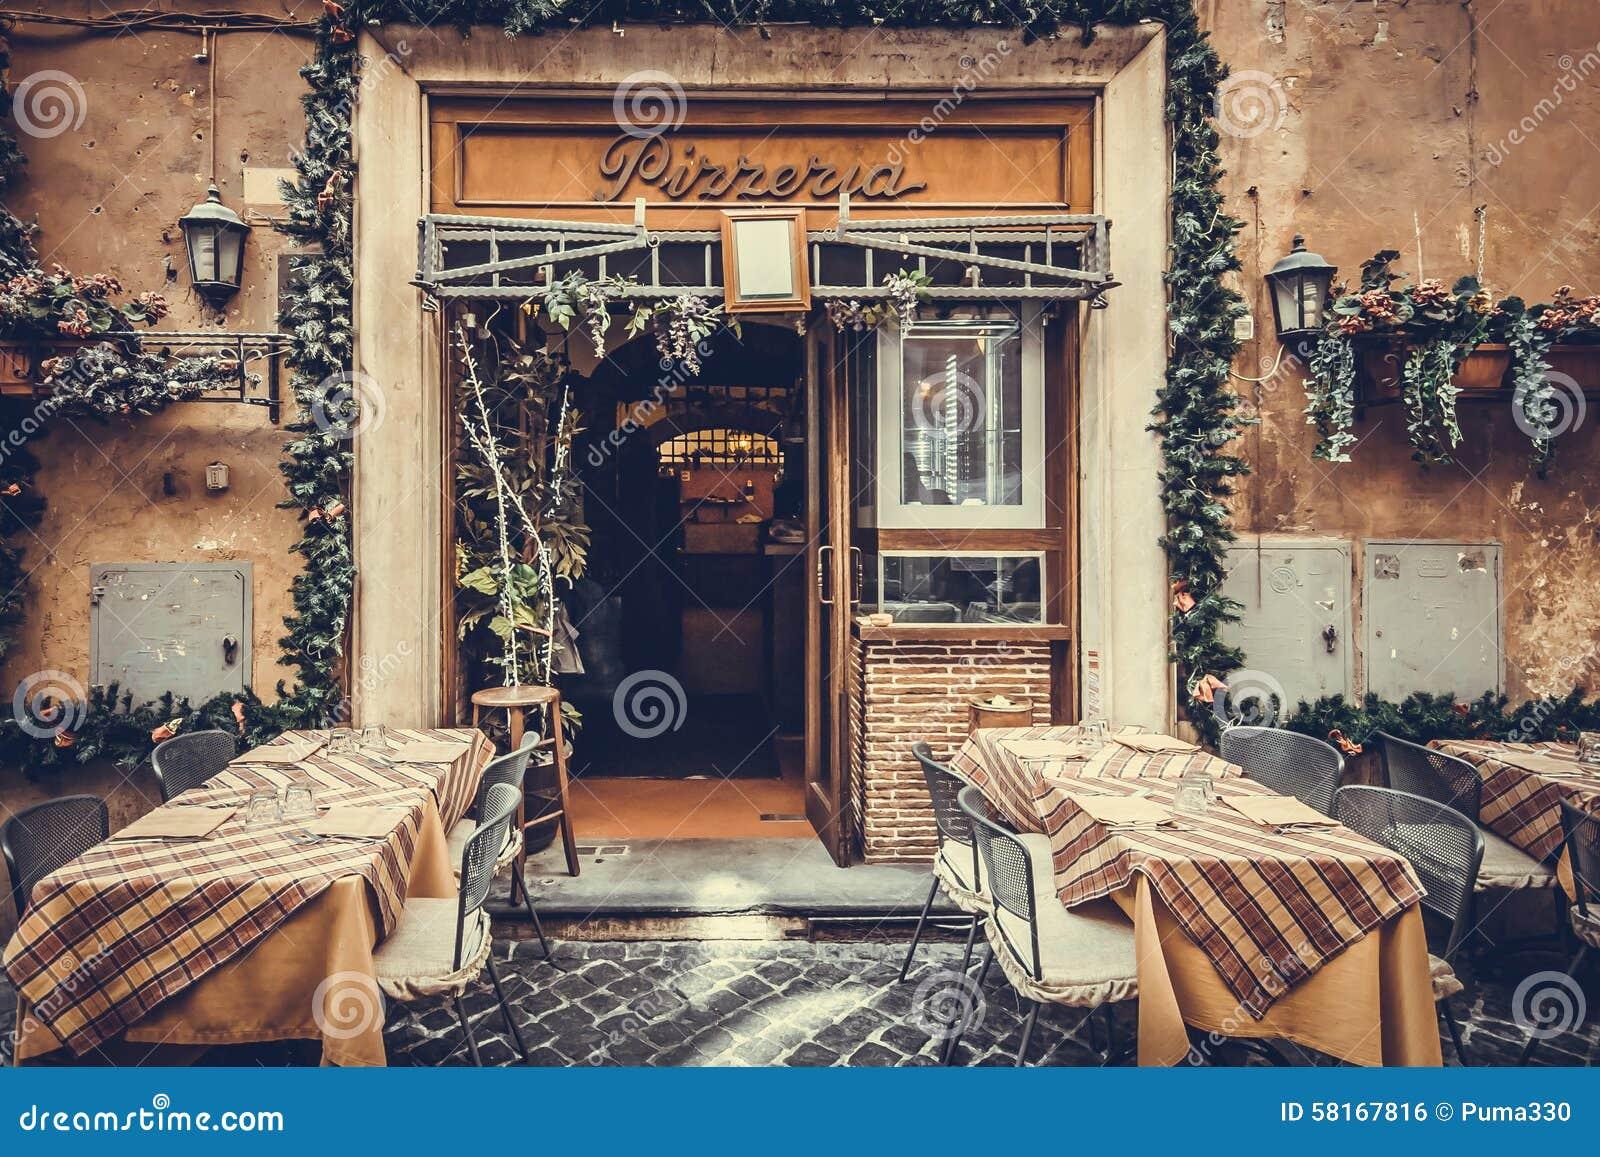 Italian Restaurant Peel Street